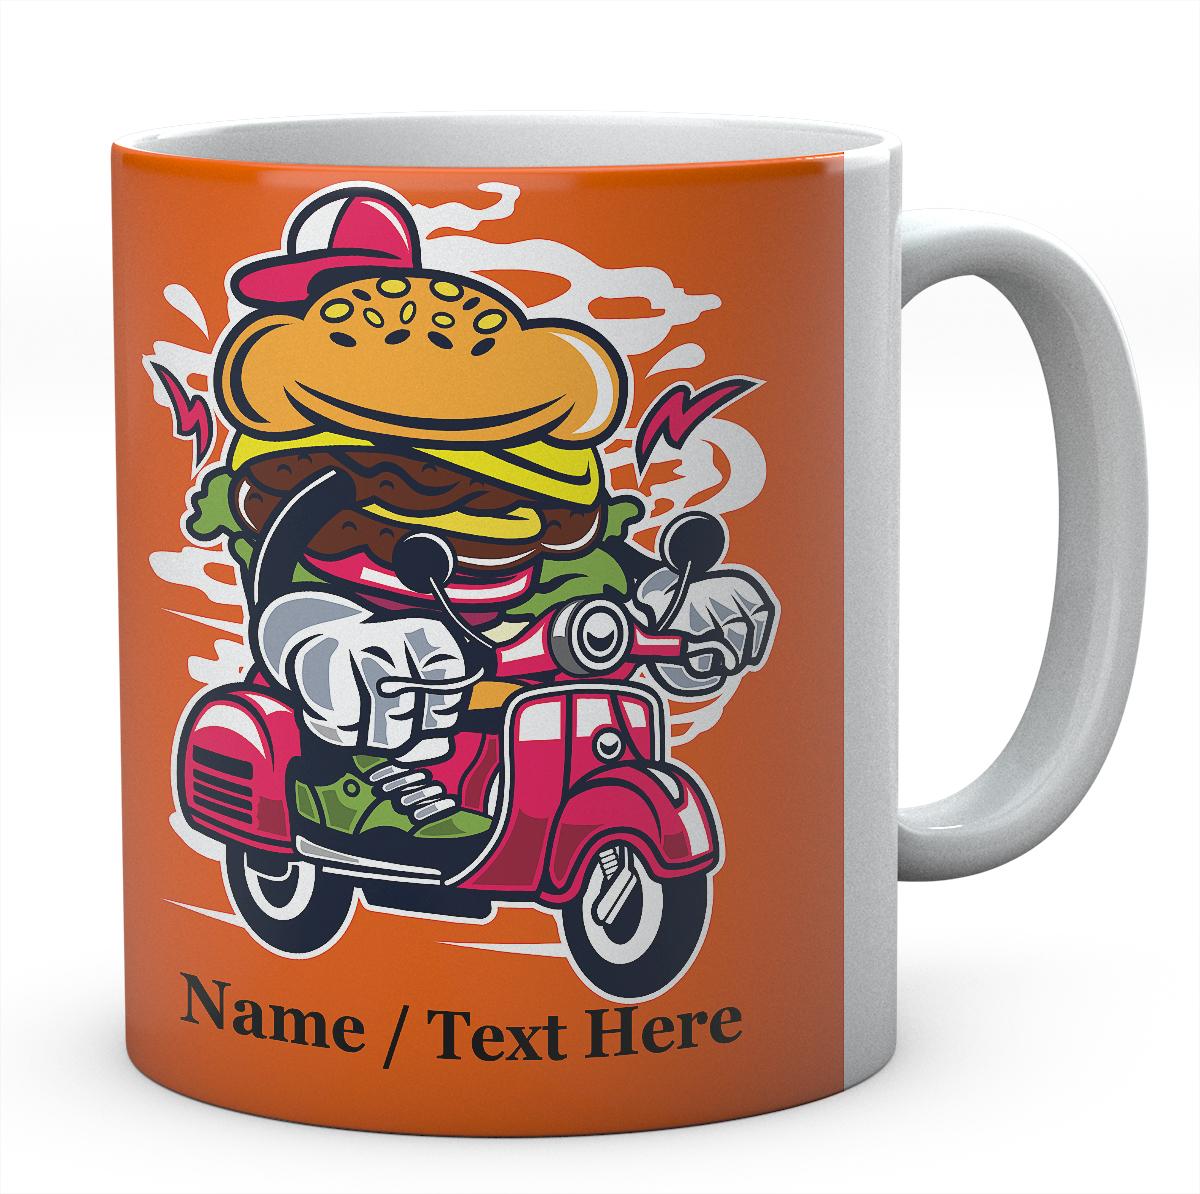 Burger Scooter Cartoon Funny Personalised Ceramic Mug